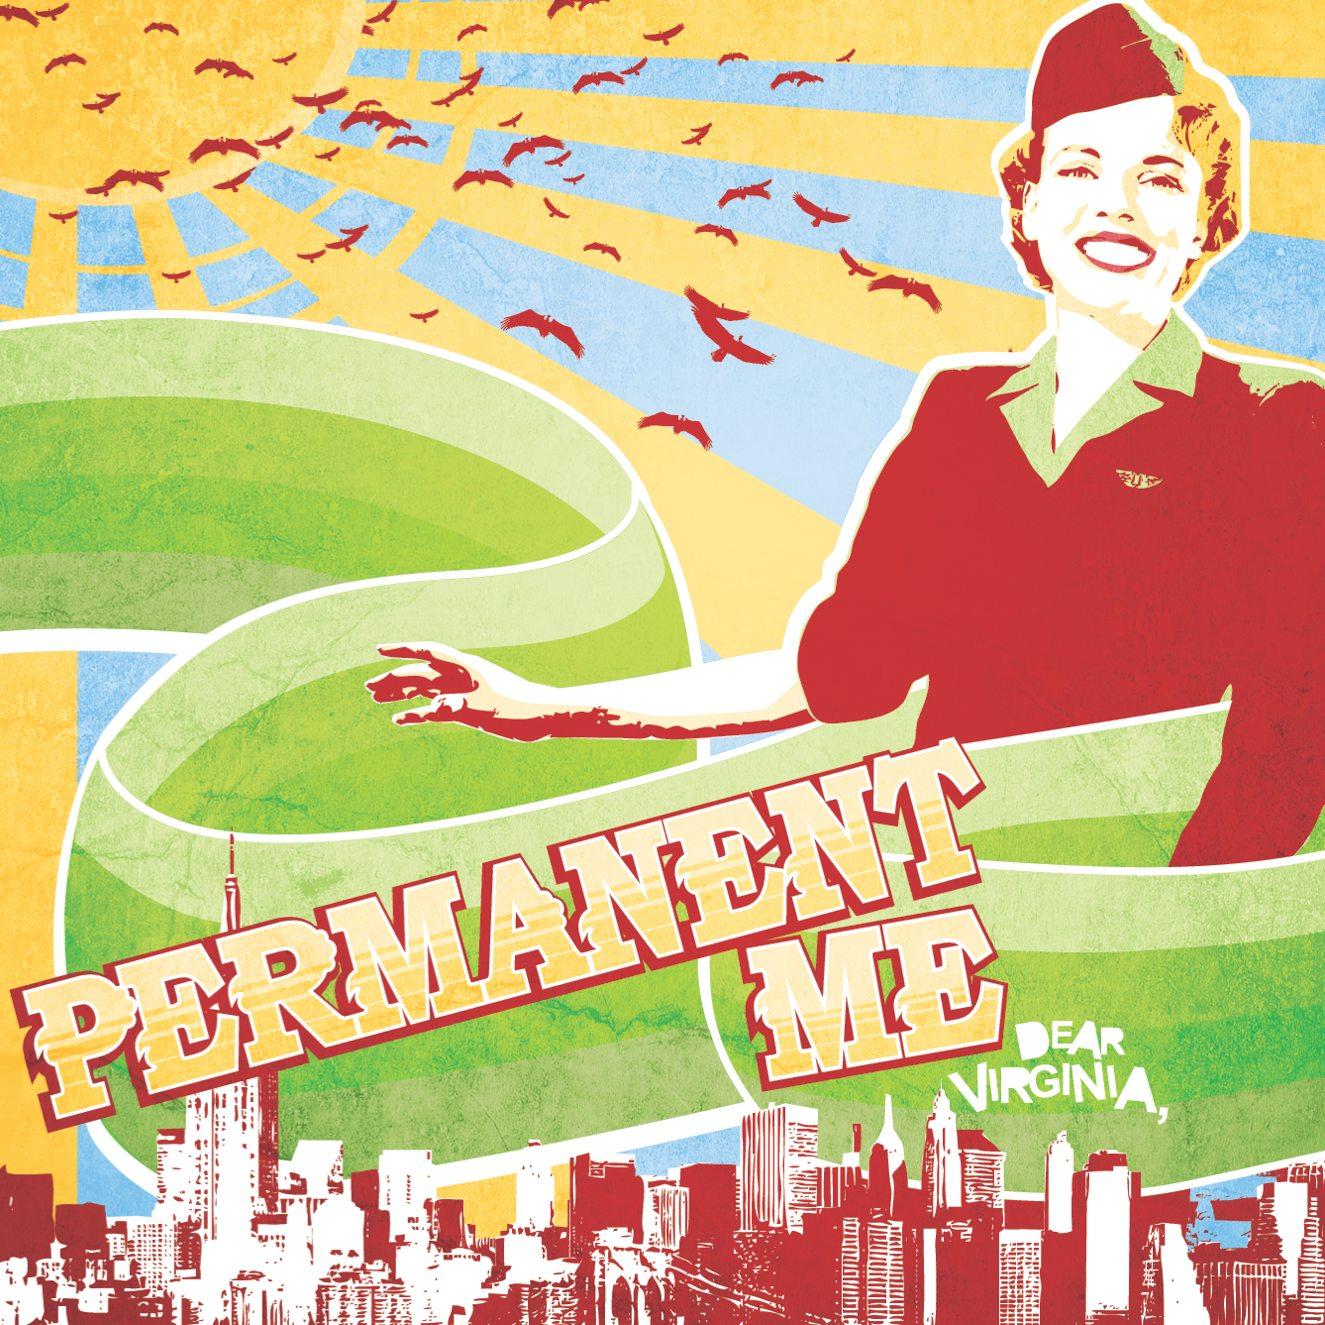 Permanent_Me_Dear_Virginia.jpg